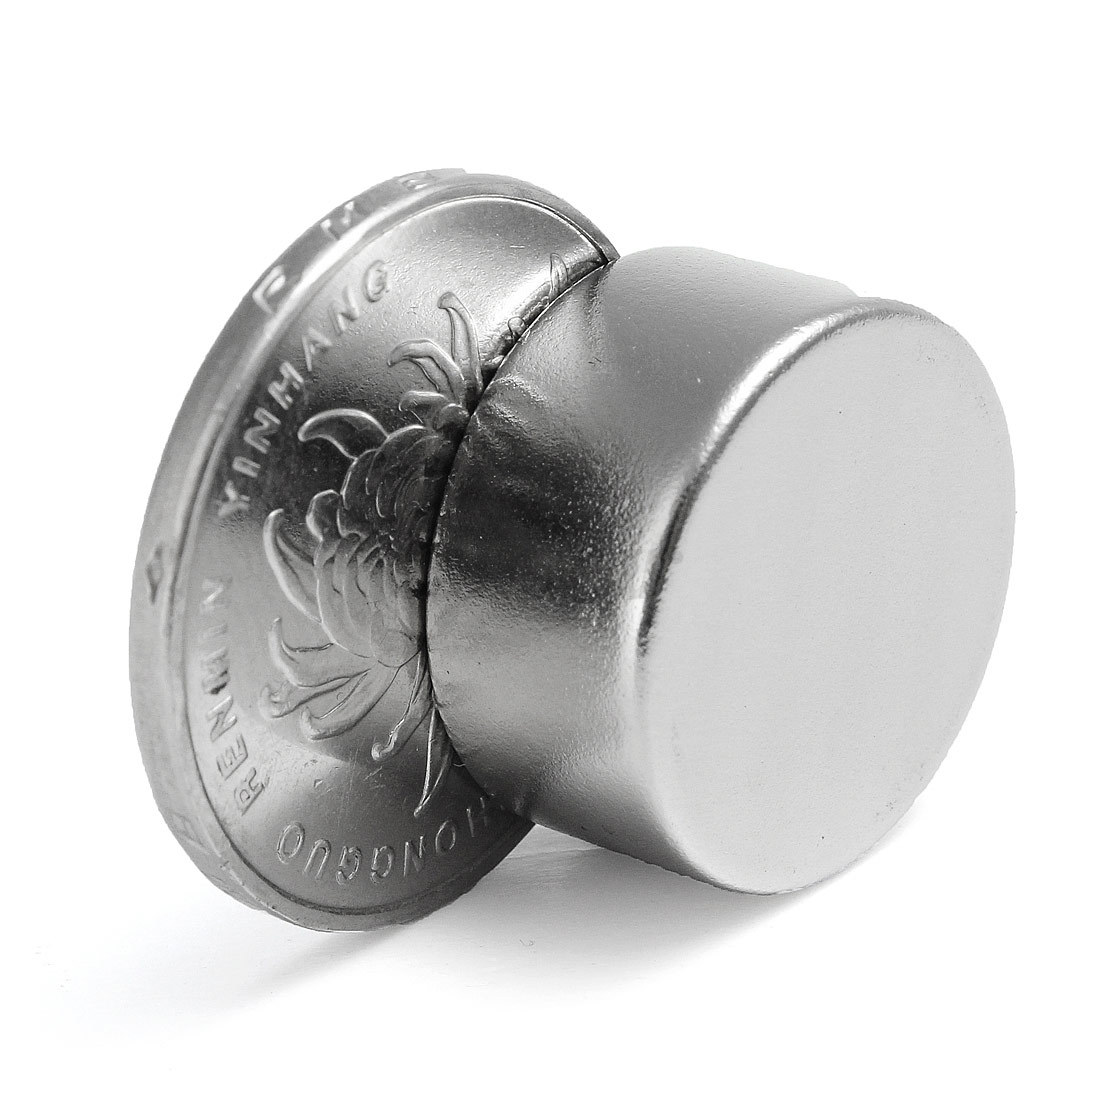 1Pcs Cylinder N52 Round Rare Earth Neodymium Strongest Grade Magnet 20mm x 10mm